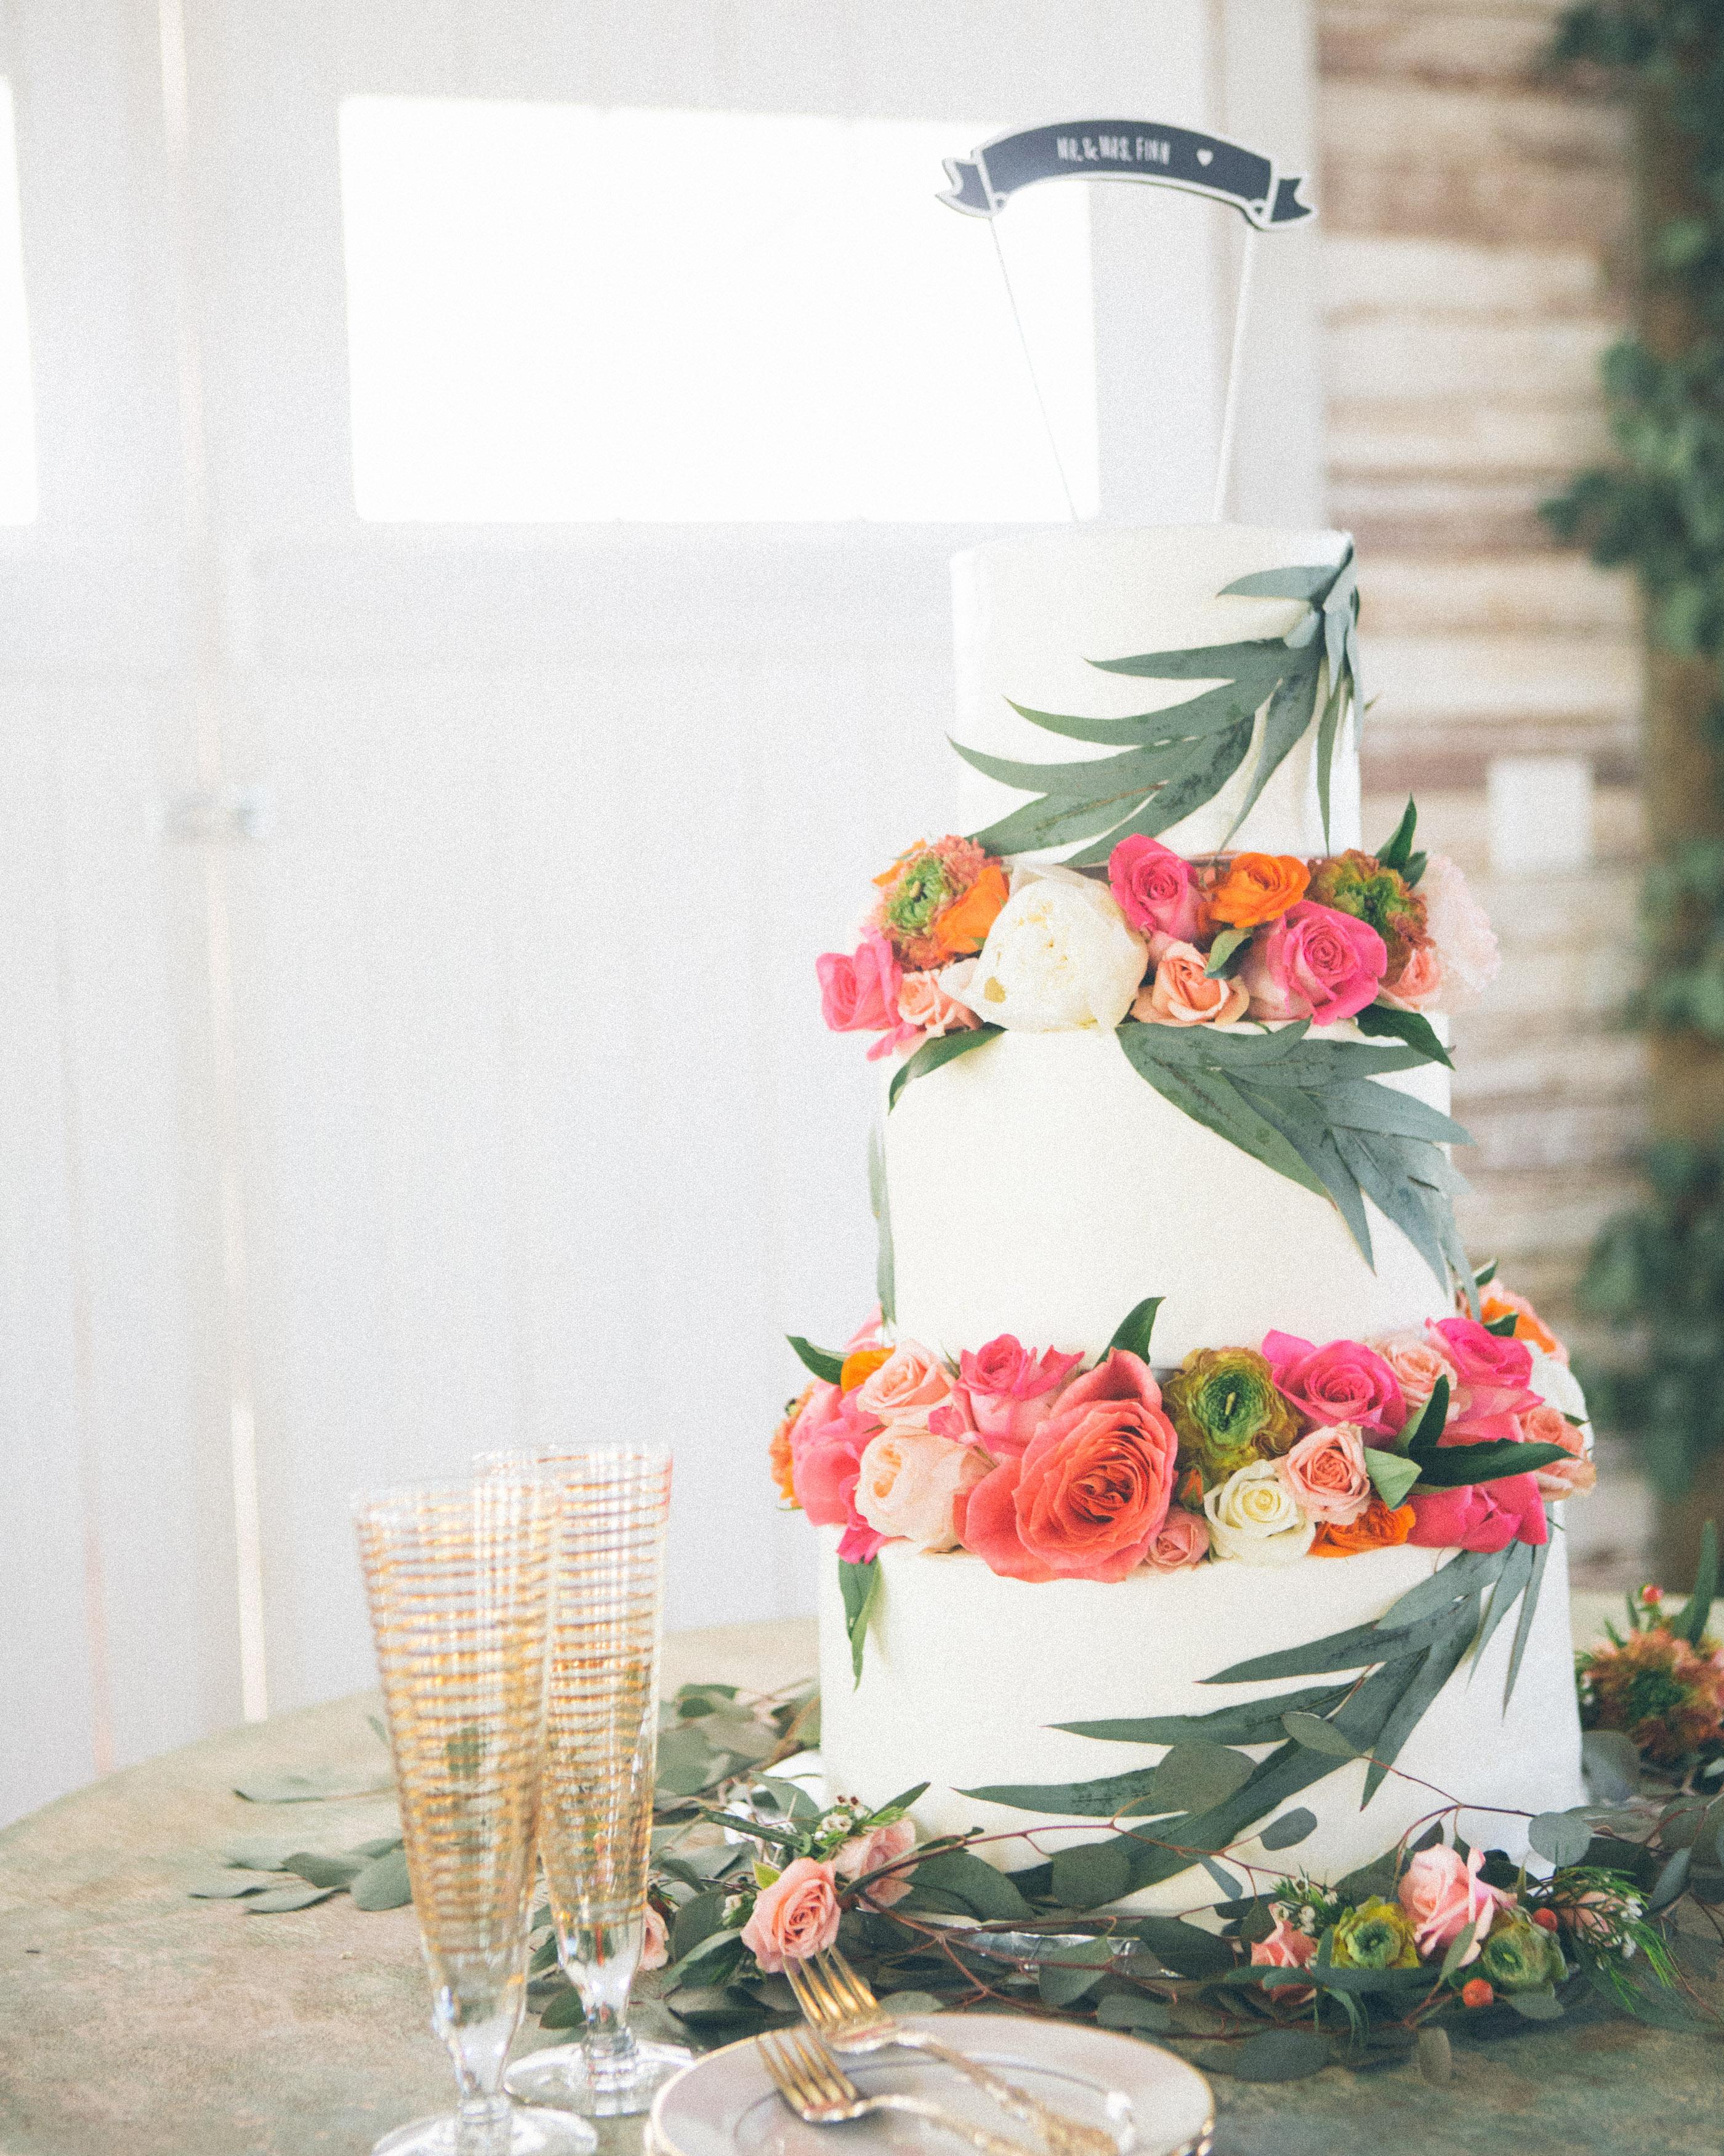 leah-michael-wedding-cake-1641-s111861-0515.jpg